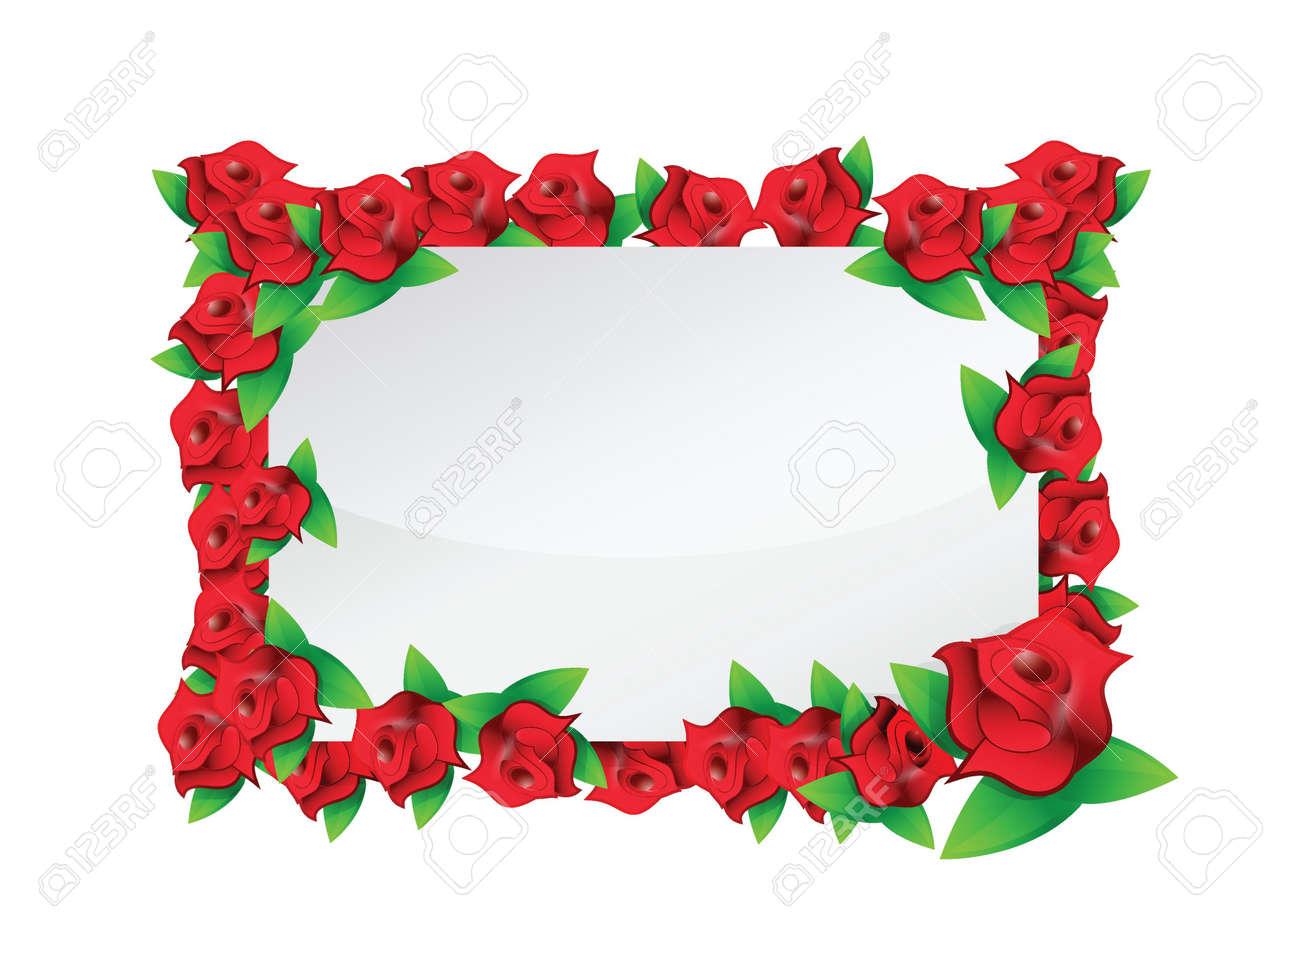 flower red frame illustration design over a white background Stock Vector - 20151967